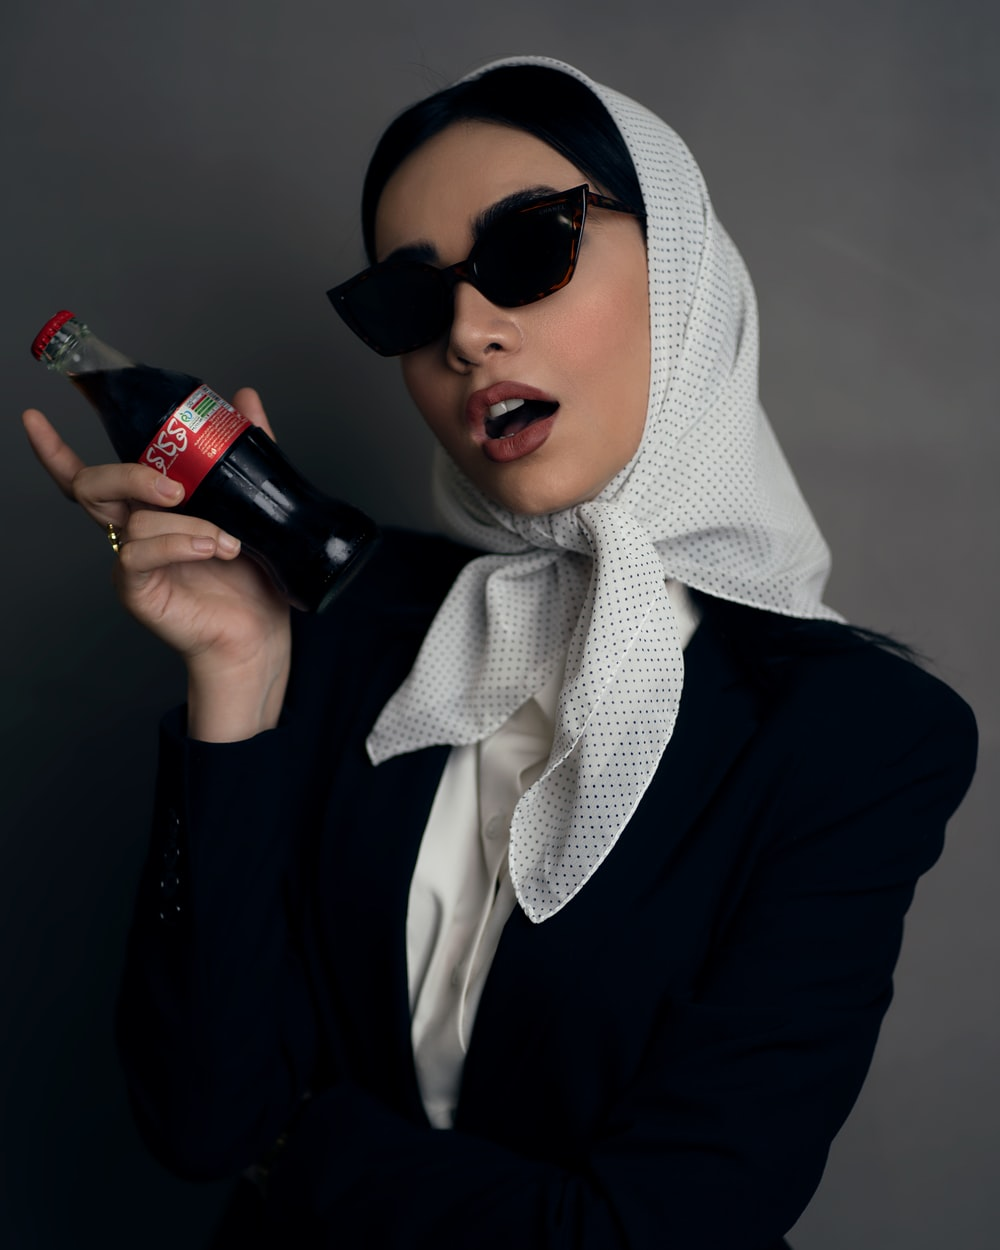 woman in black long sleeve shirt holding black bottle